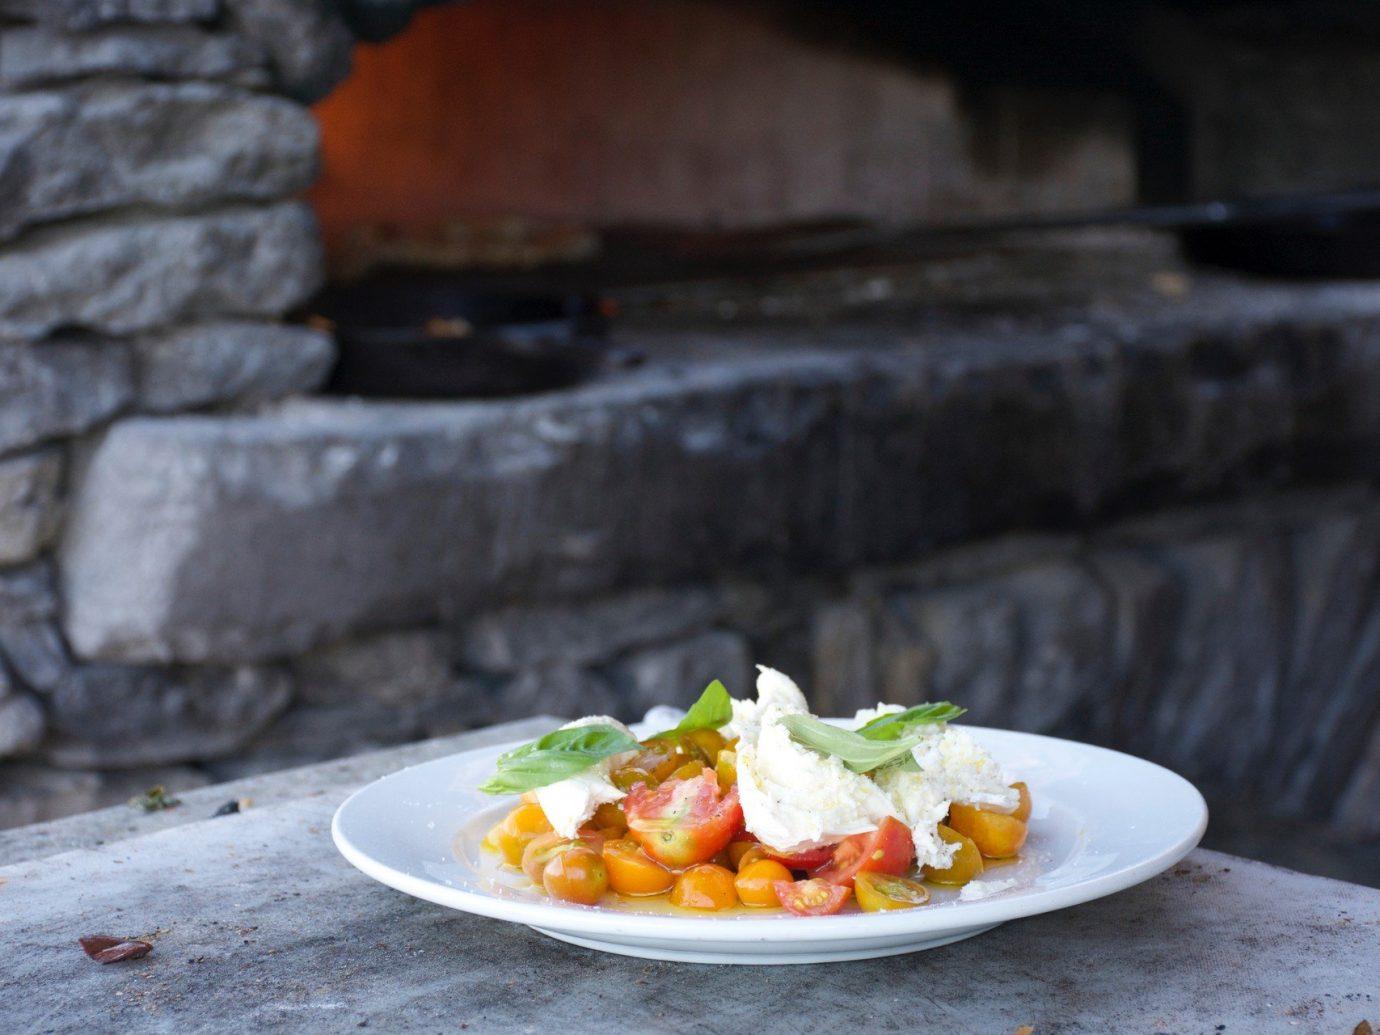 Jetsetter Guides food plate dish slice cuisine meal produce sense restaurant